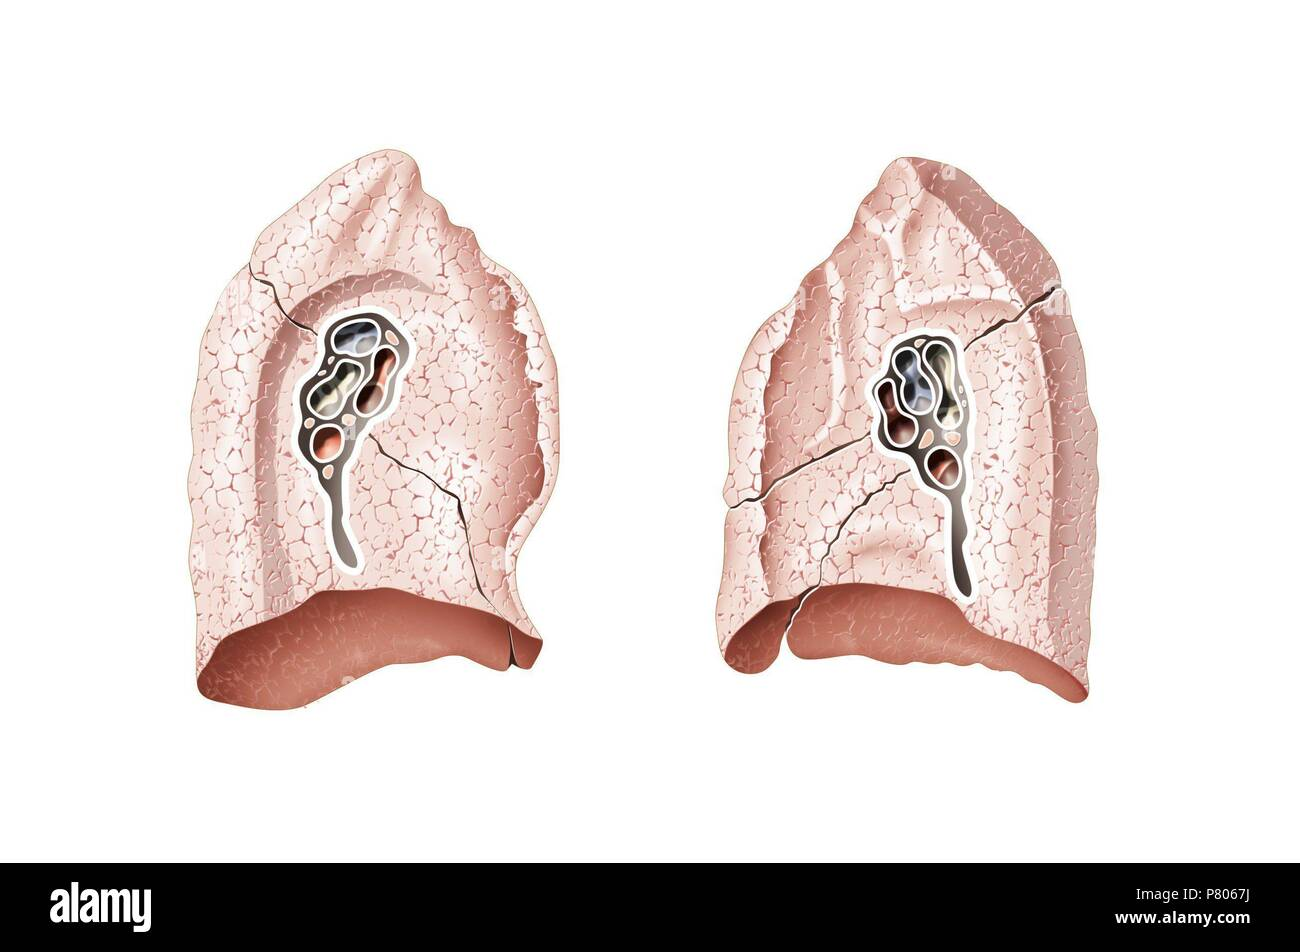 Hilio pulmonar Foto & Imagen De Stock: 211446582 - Alamy